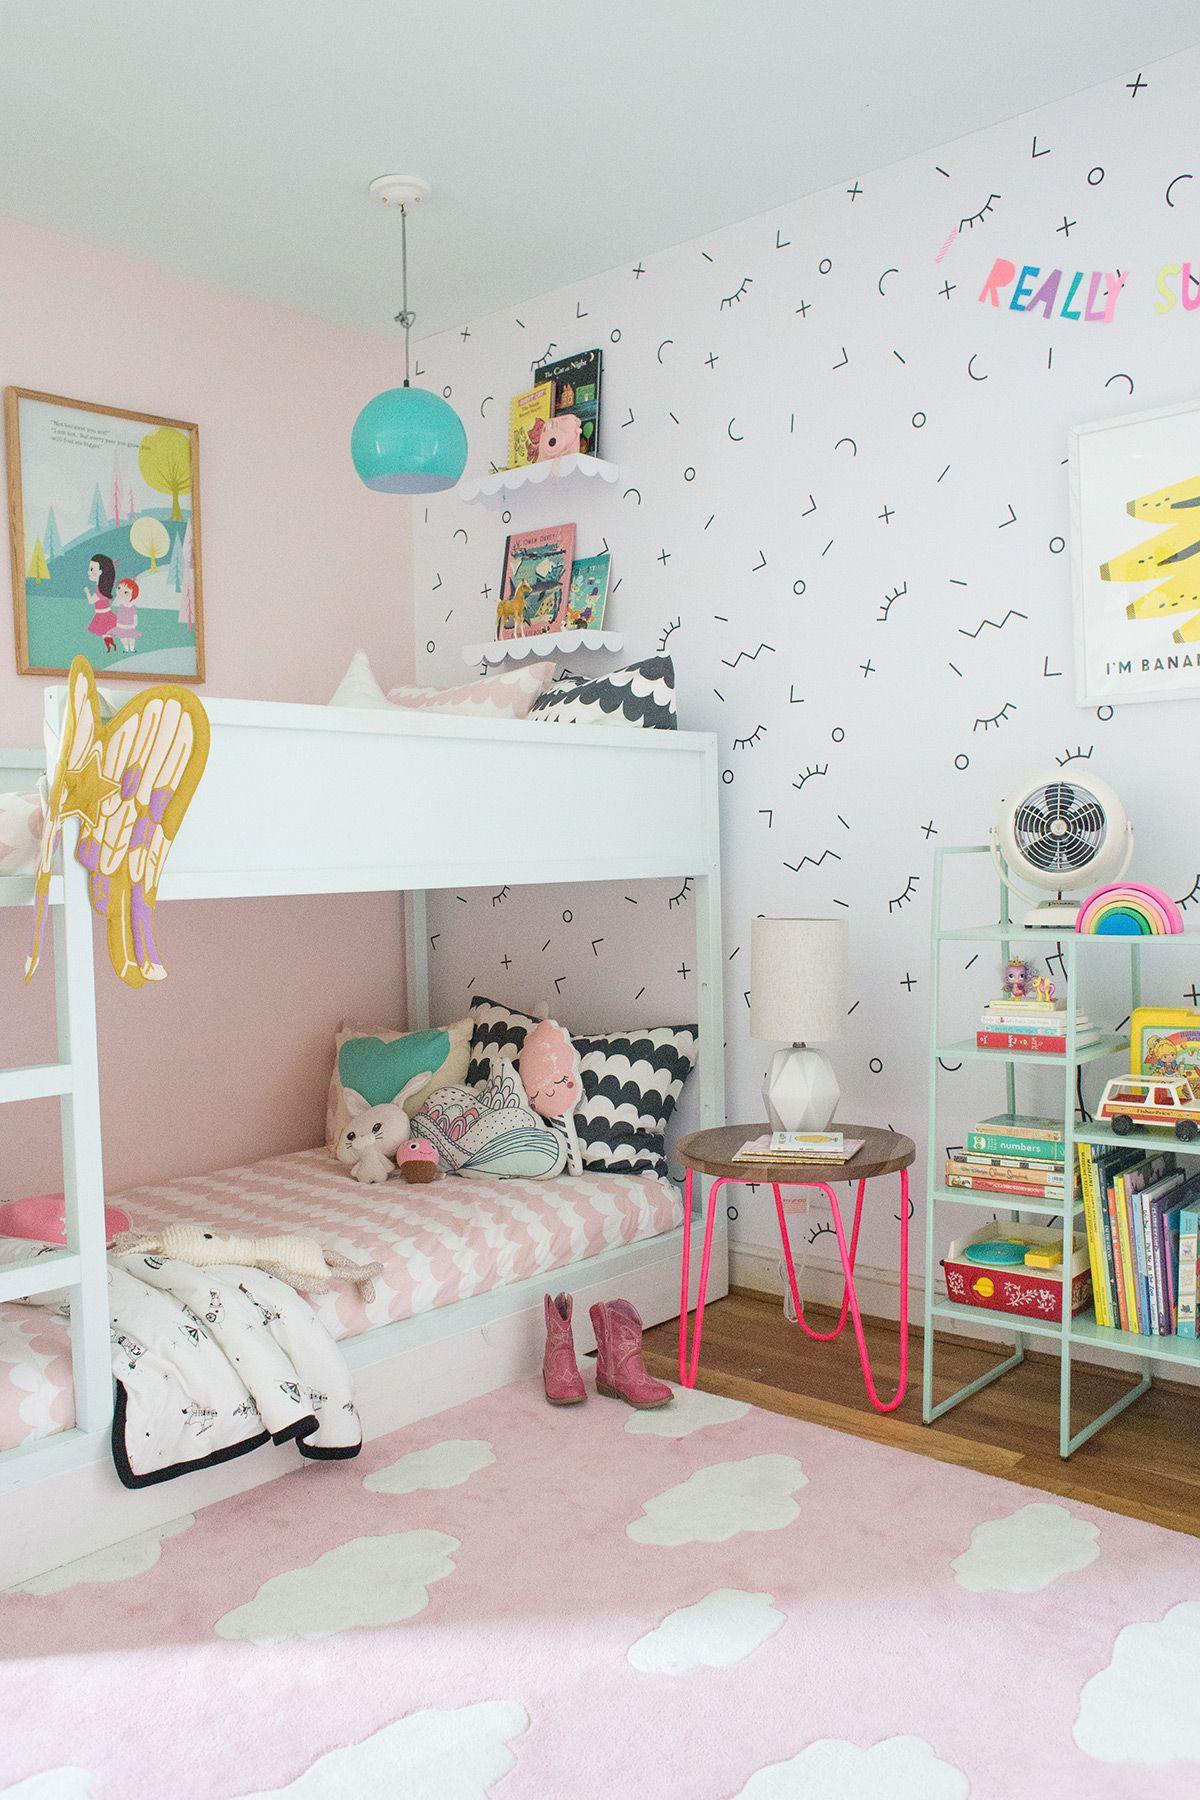 Diy Riser For Kura Bunk Bed Kid Room Decor Girl Room Bed For